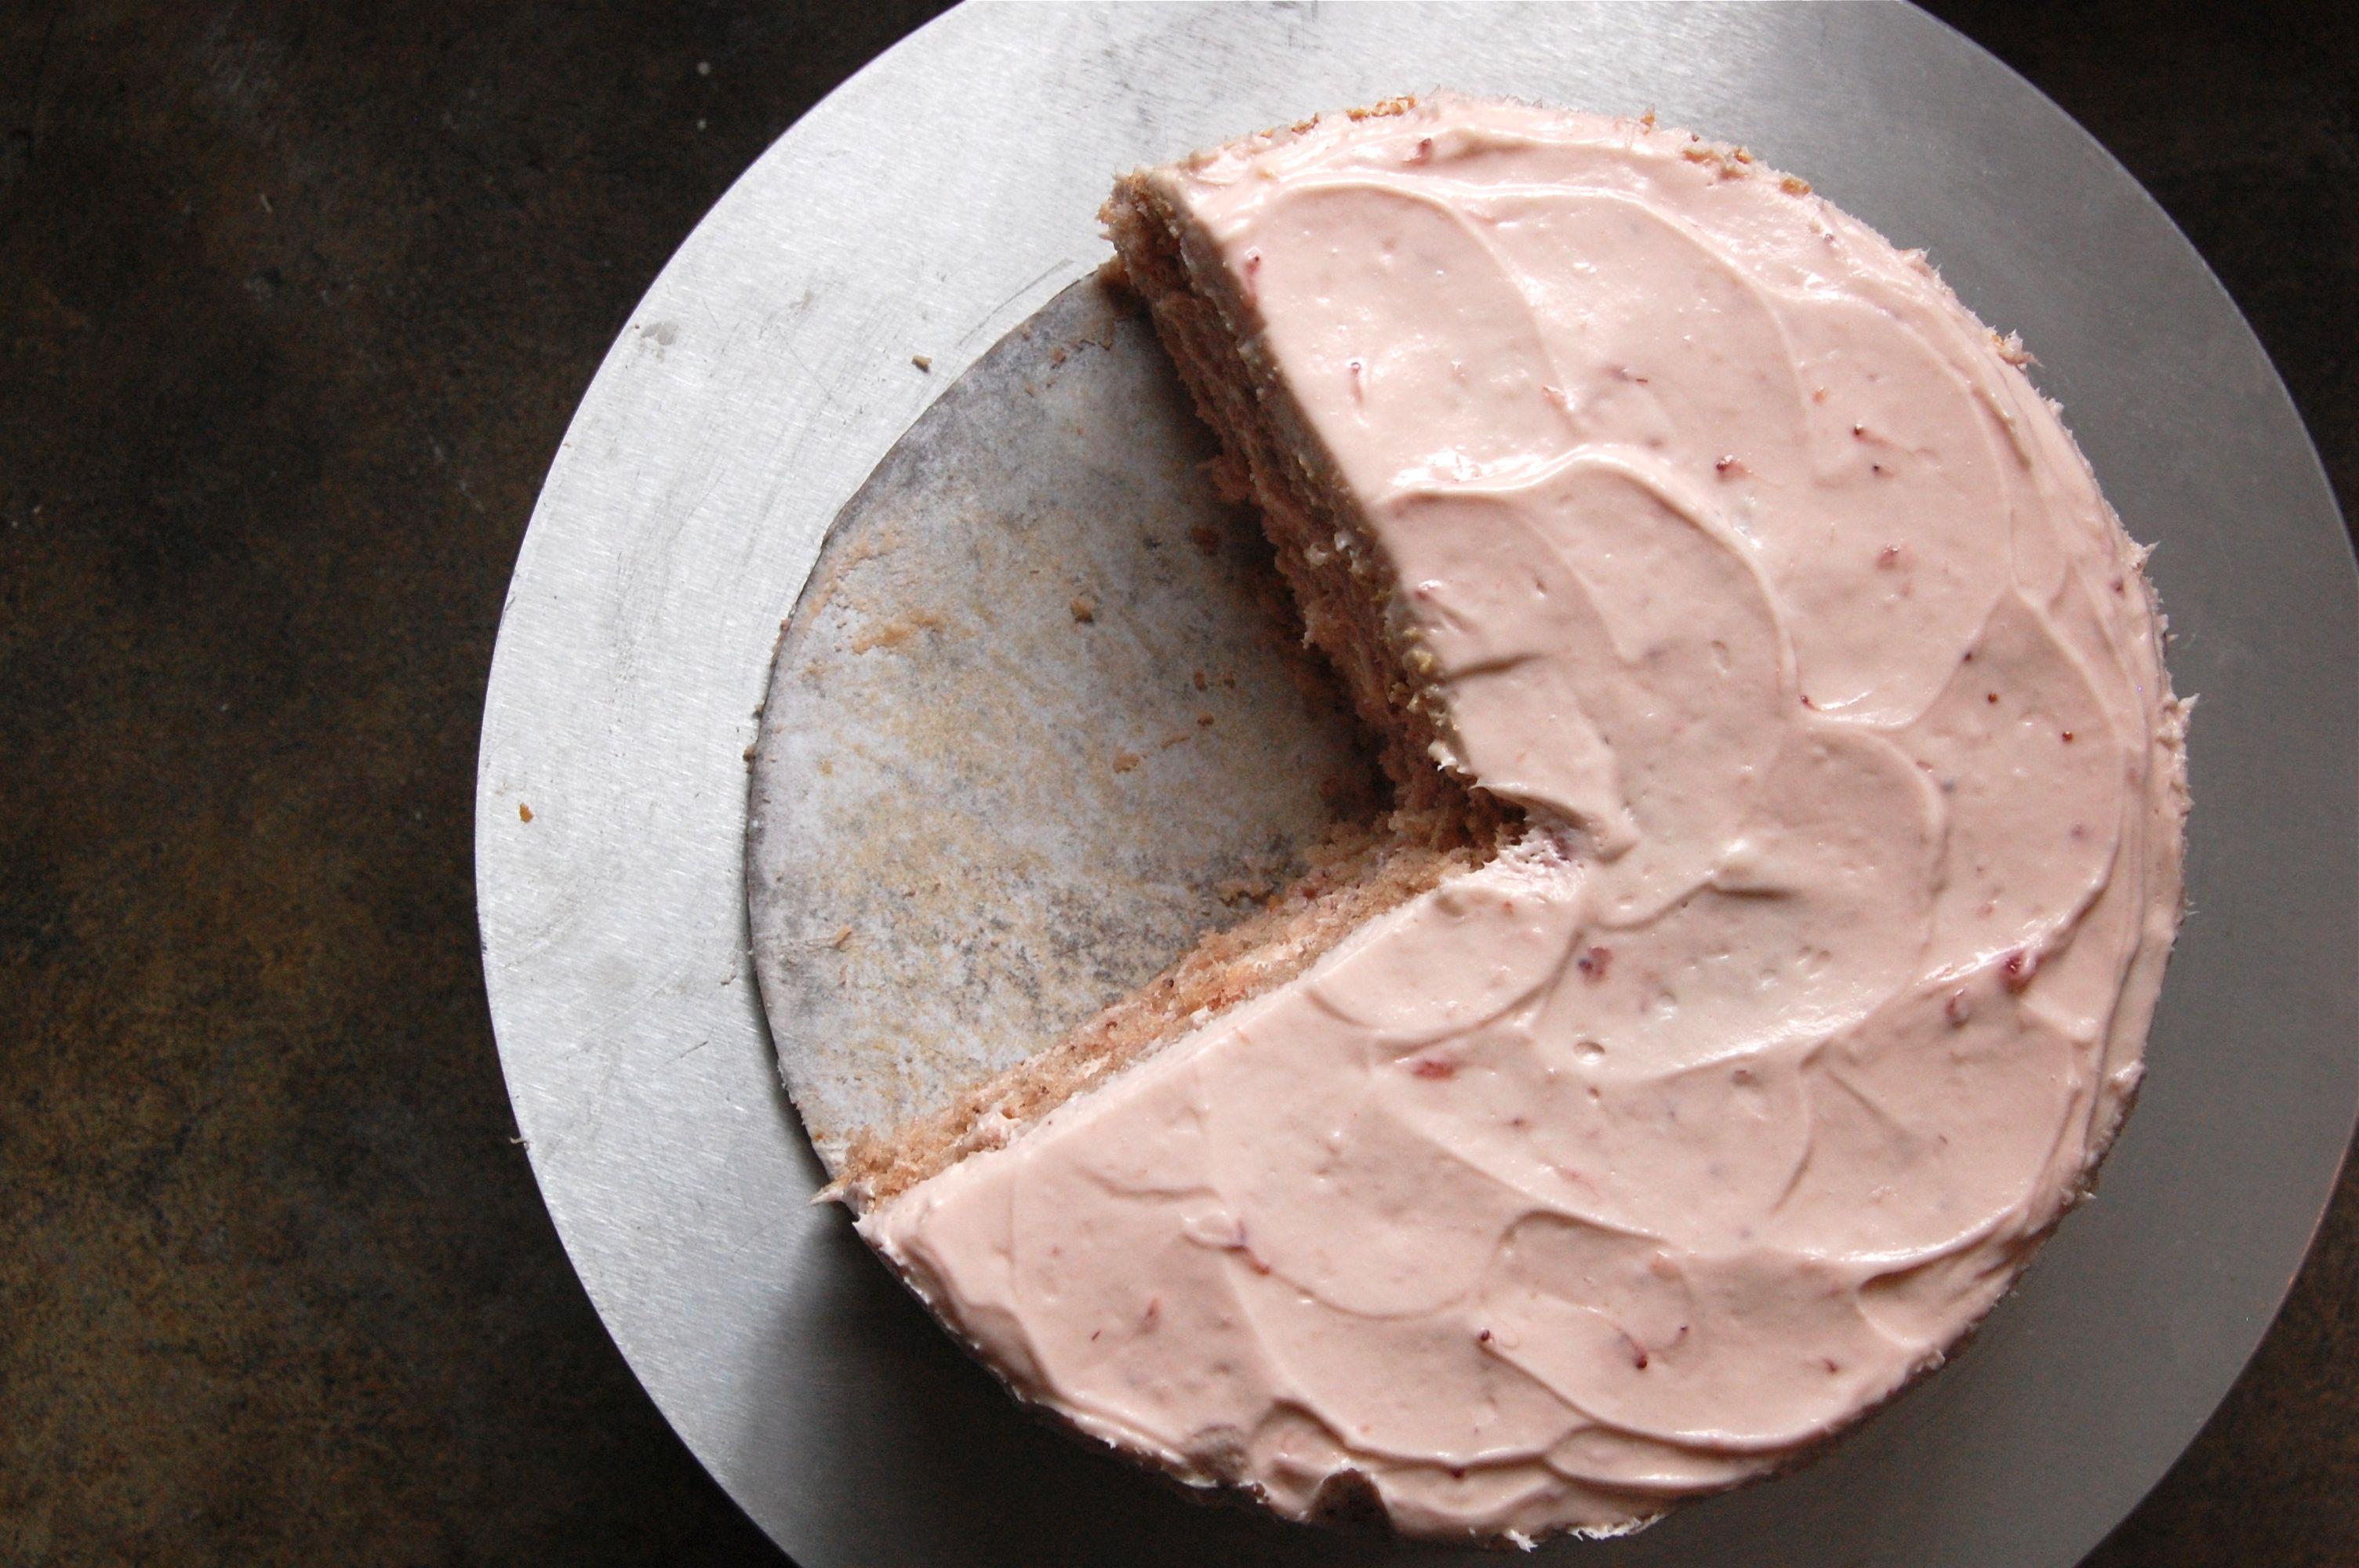 Edgars Strawberry Pound Cake